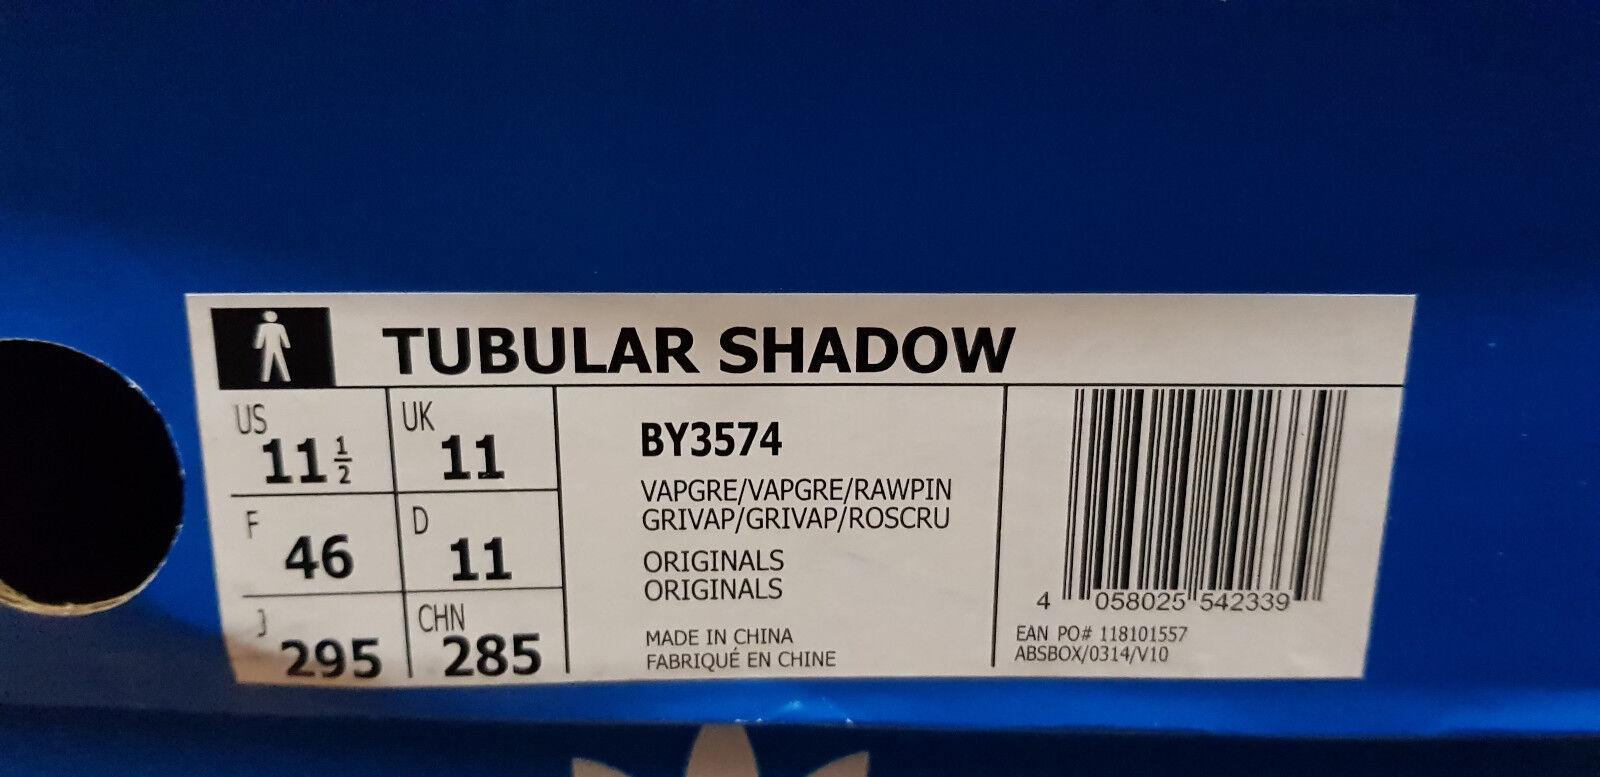 2018 Adidas Originals Originals Originals Shadow ® (Tubular Uomo Taglia UK: 7 - 13) di vapore Grigio Marrone ee6d30